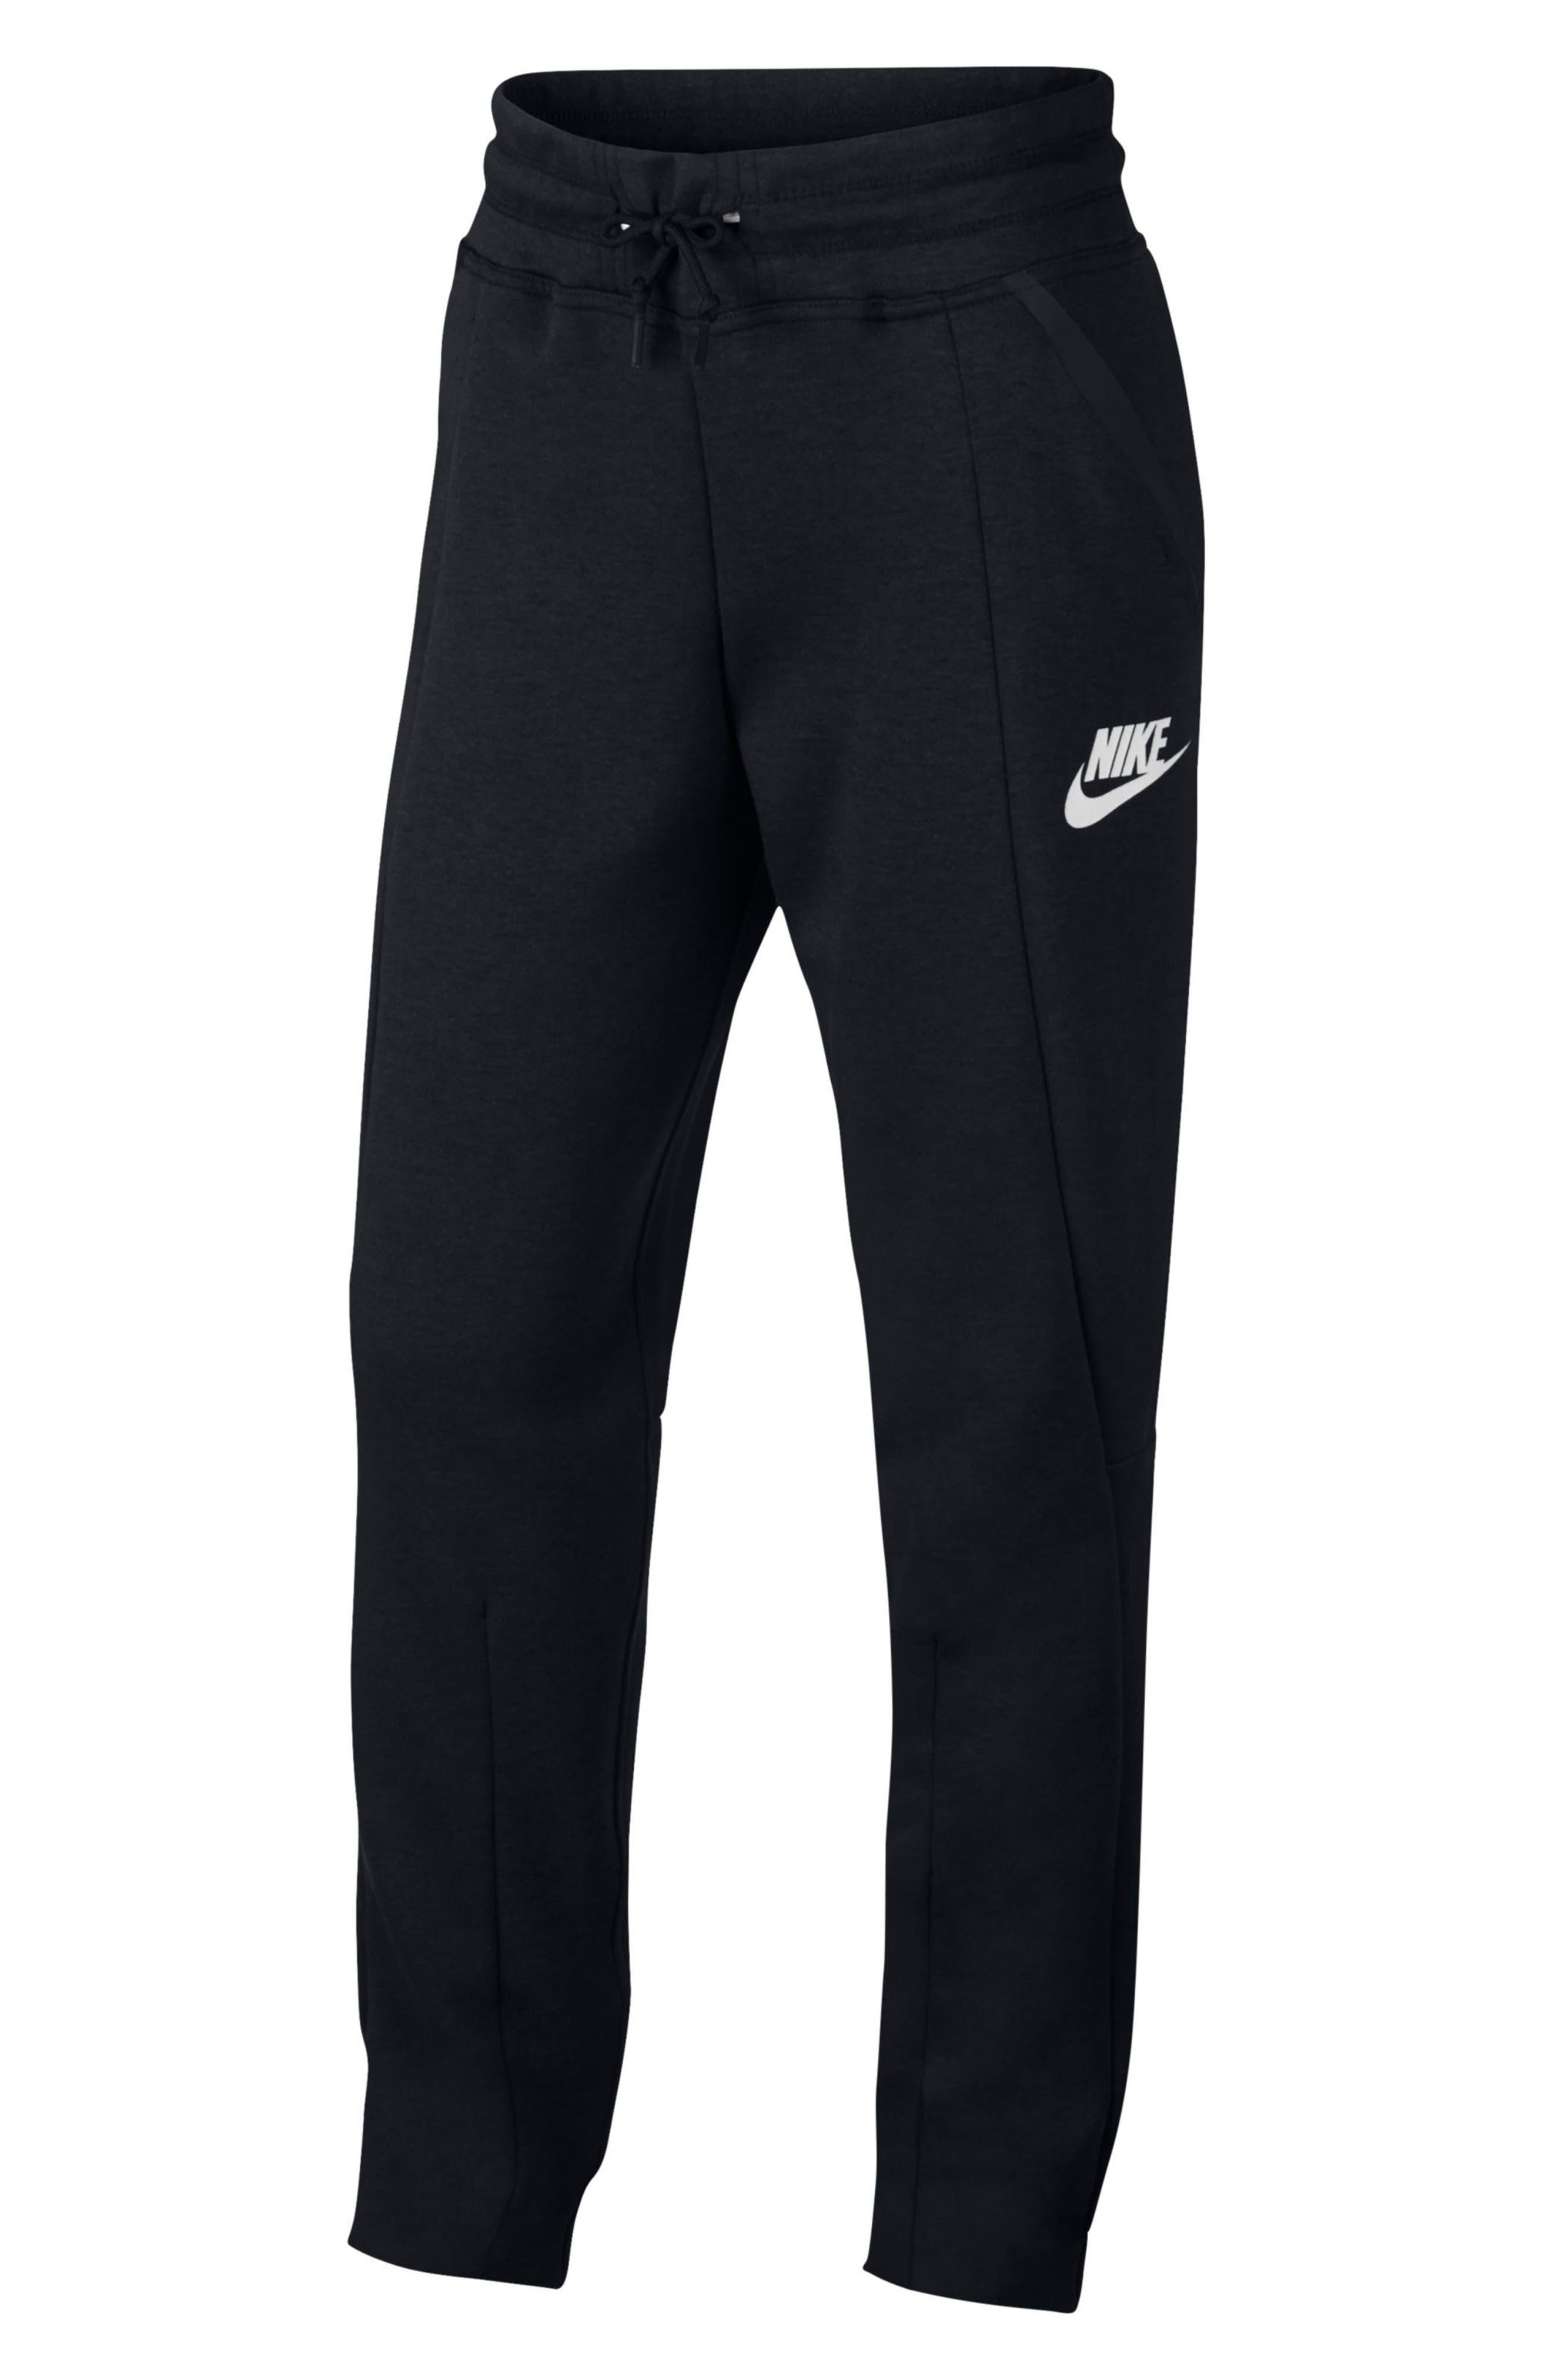 Tech Fleece Pants,                         Main,                         color, Black/ White